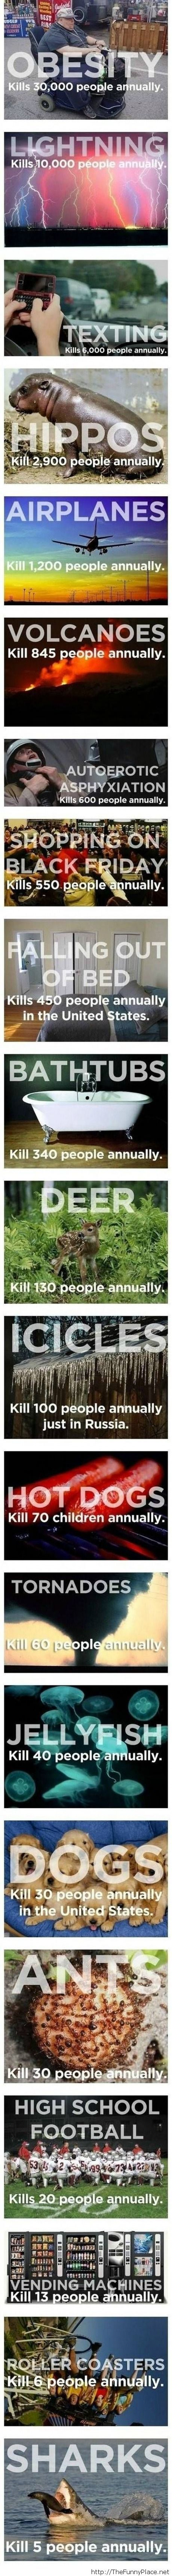 Statistics of life